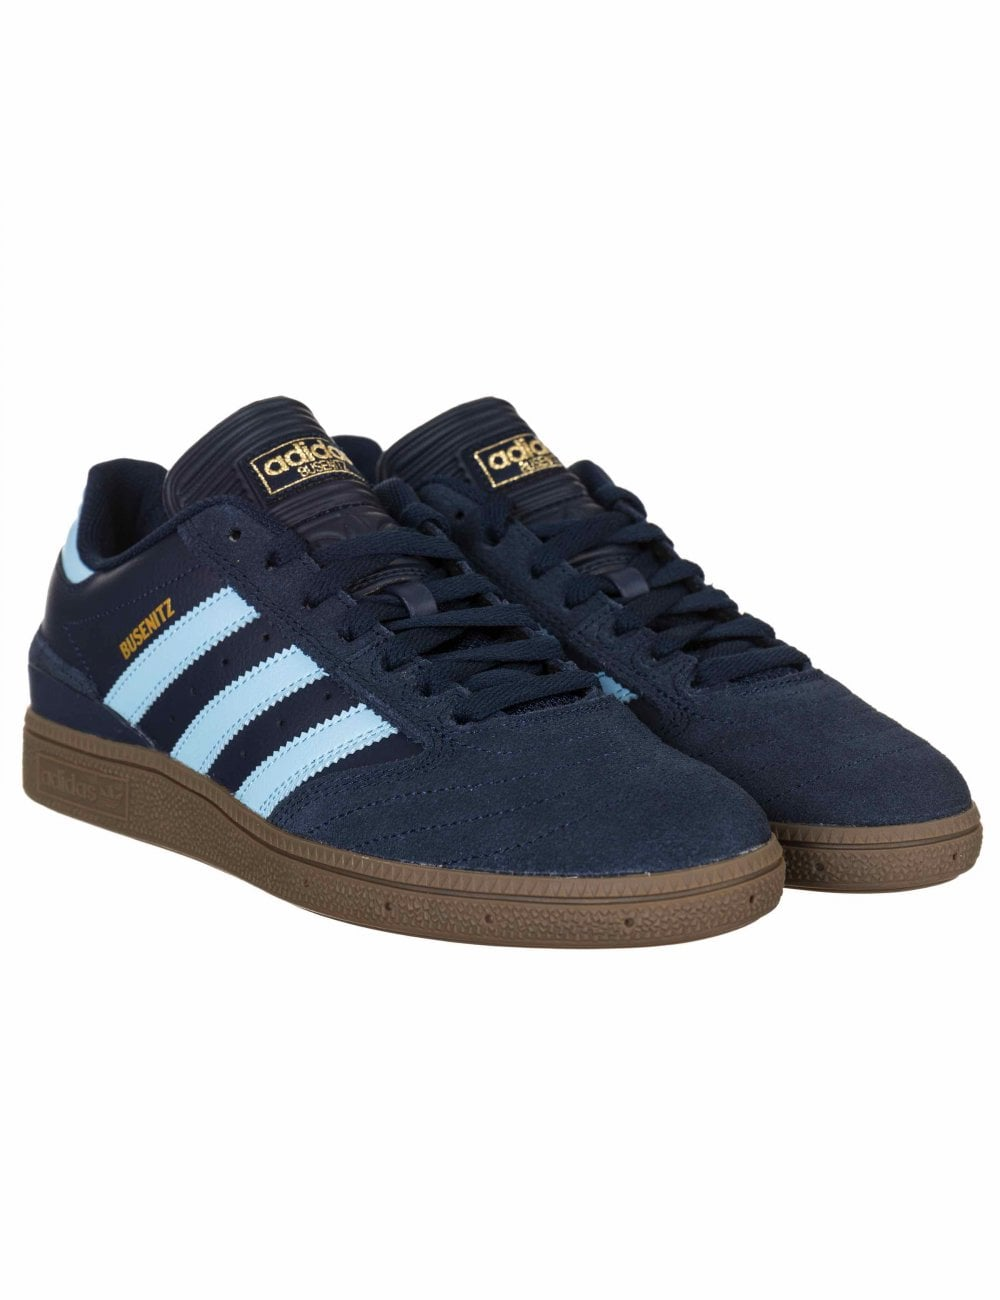 best value c30b0 e499b Adidas Skateboarding Busenitz Pro Trainers - Collegiate NavyCL Blue